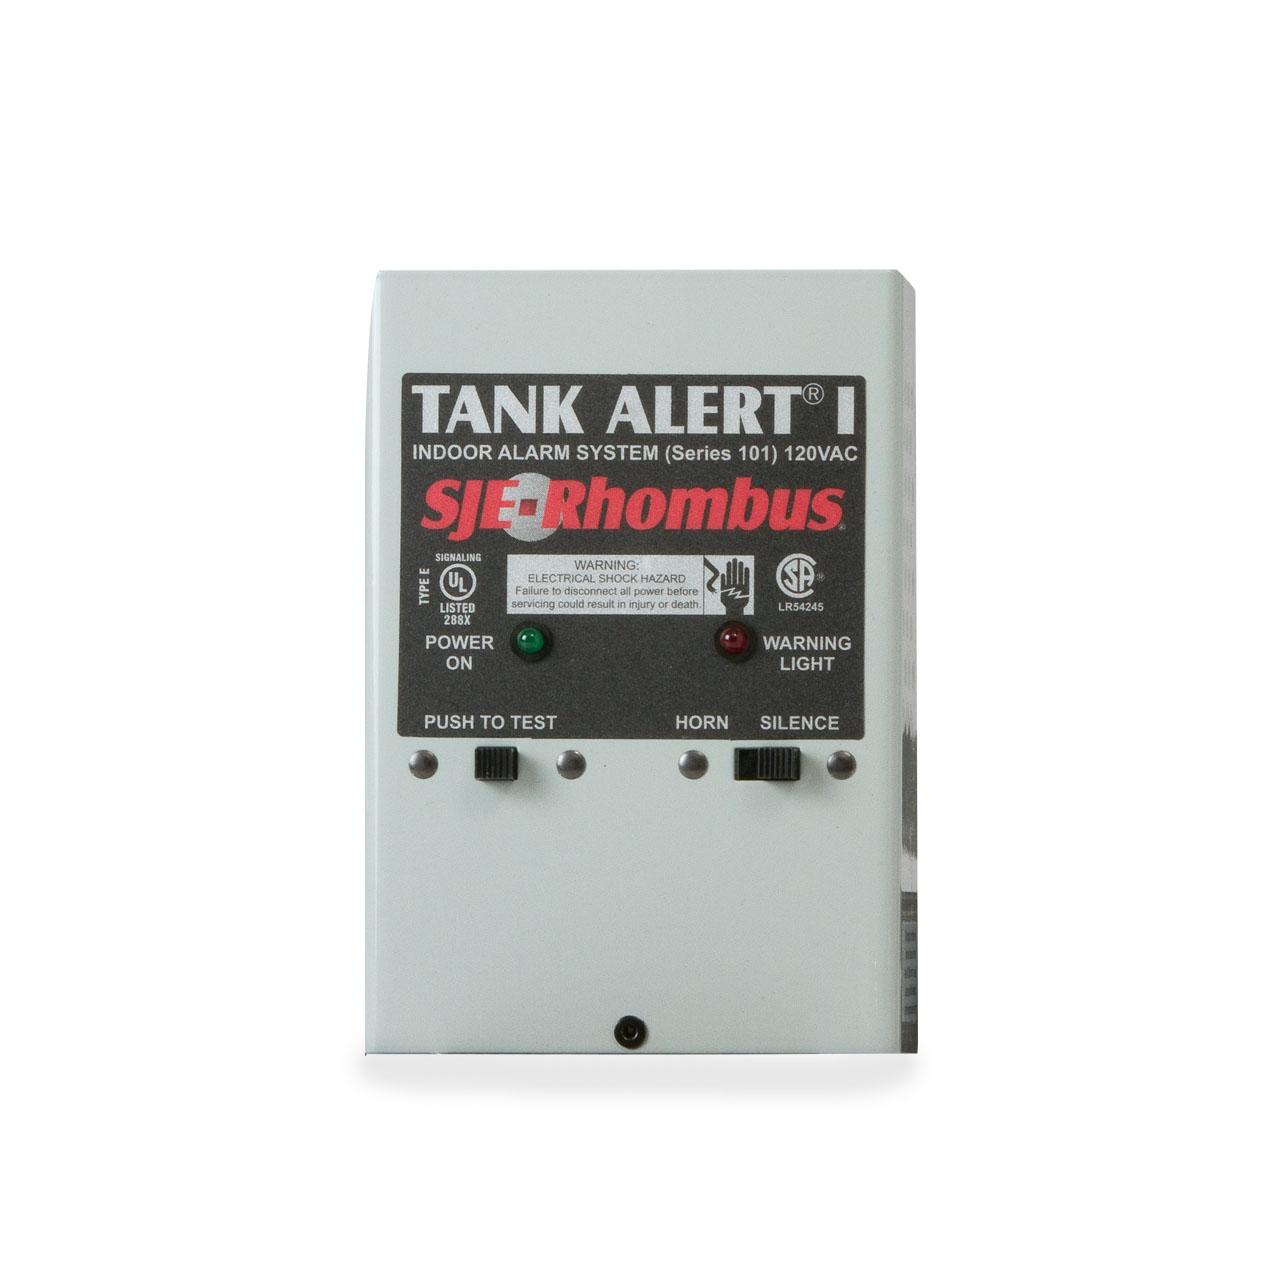 sje100nfxxxx_001_wbg sje rhombus sje rhombus tank alert i alarm system 120v no float SJE-Rhombus Logo at panicattacktreatment.co